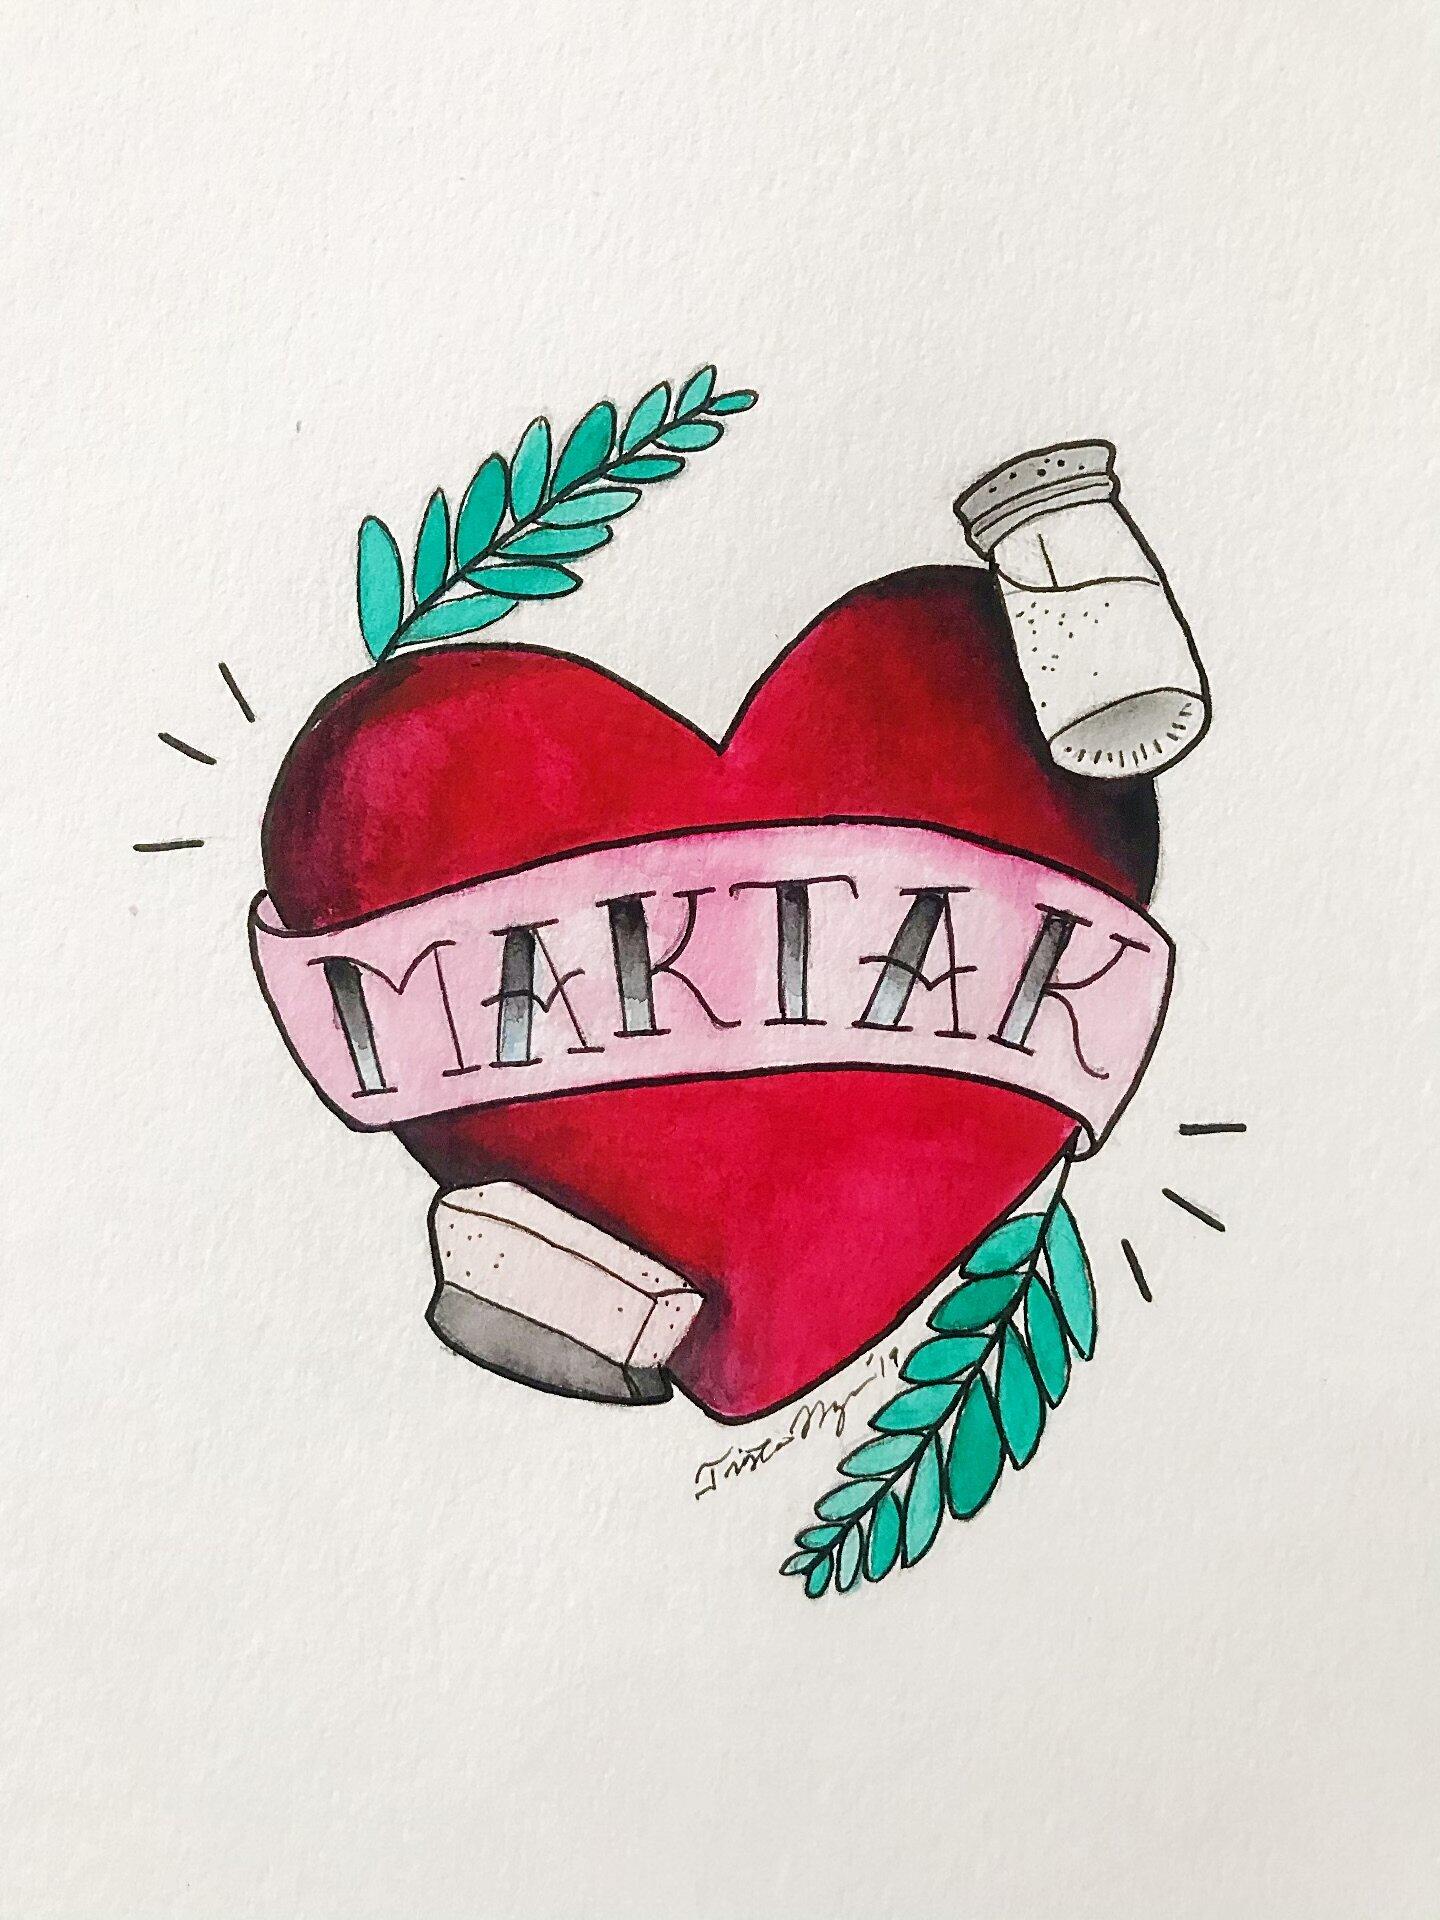 """Maktak"" undefined dimensions (2019)"